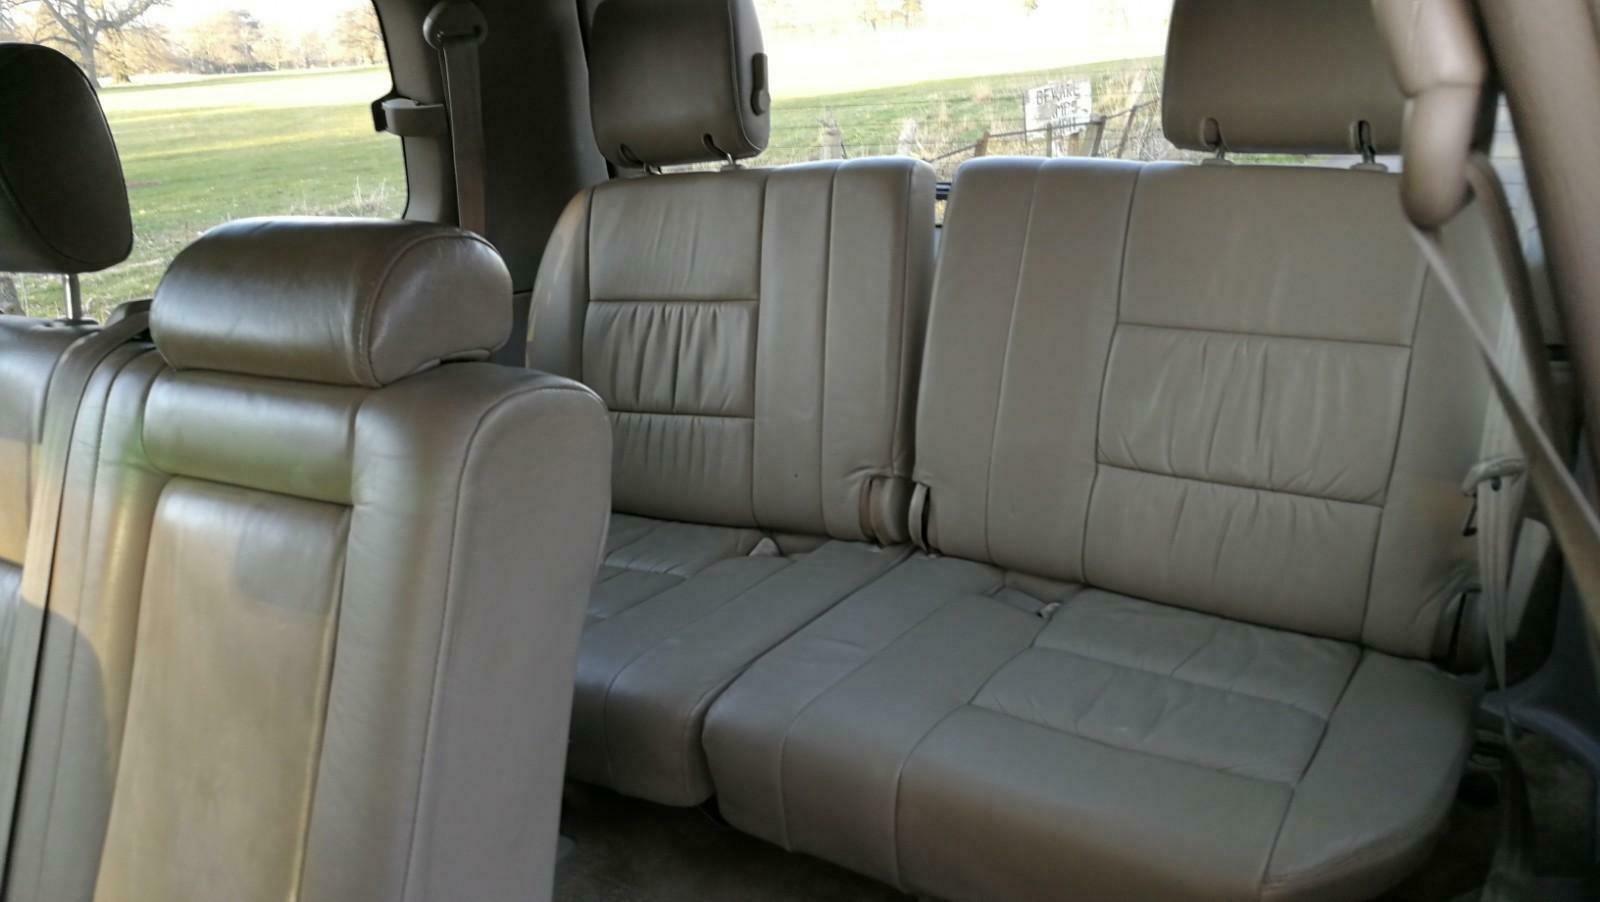 1999 Toyota Landcruiser 4.7V8 Amazon 7 Seater 119k FSH For Sale (picture 5 of 6)